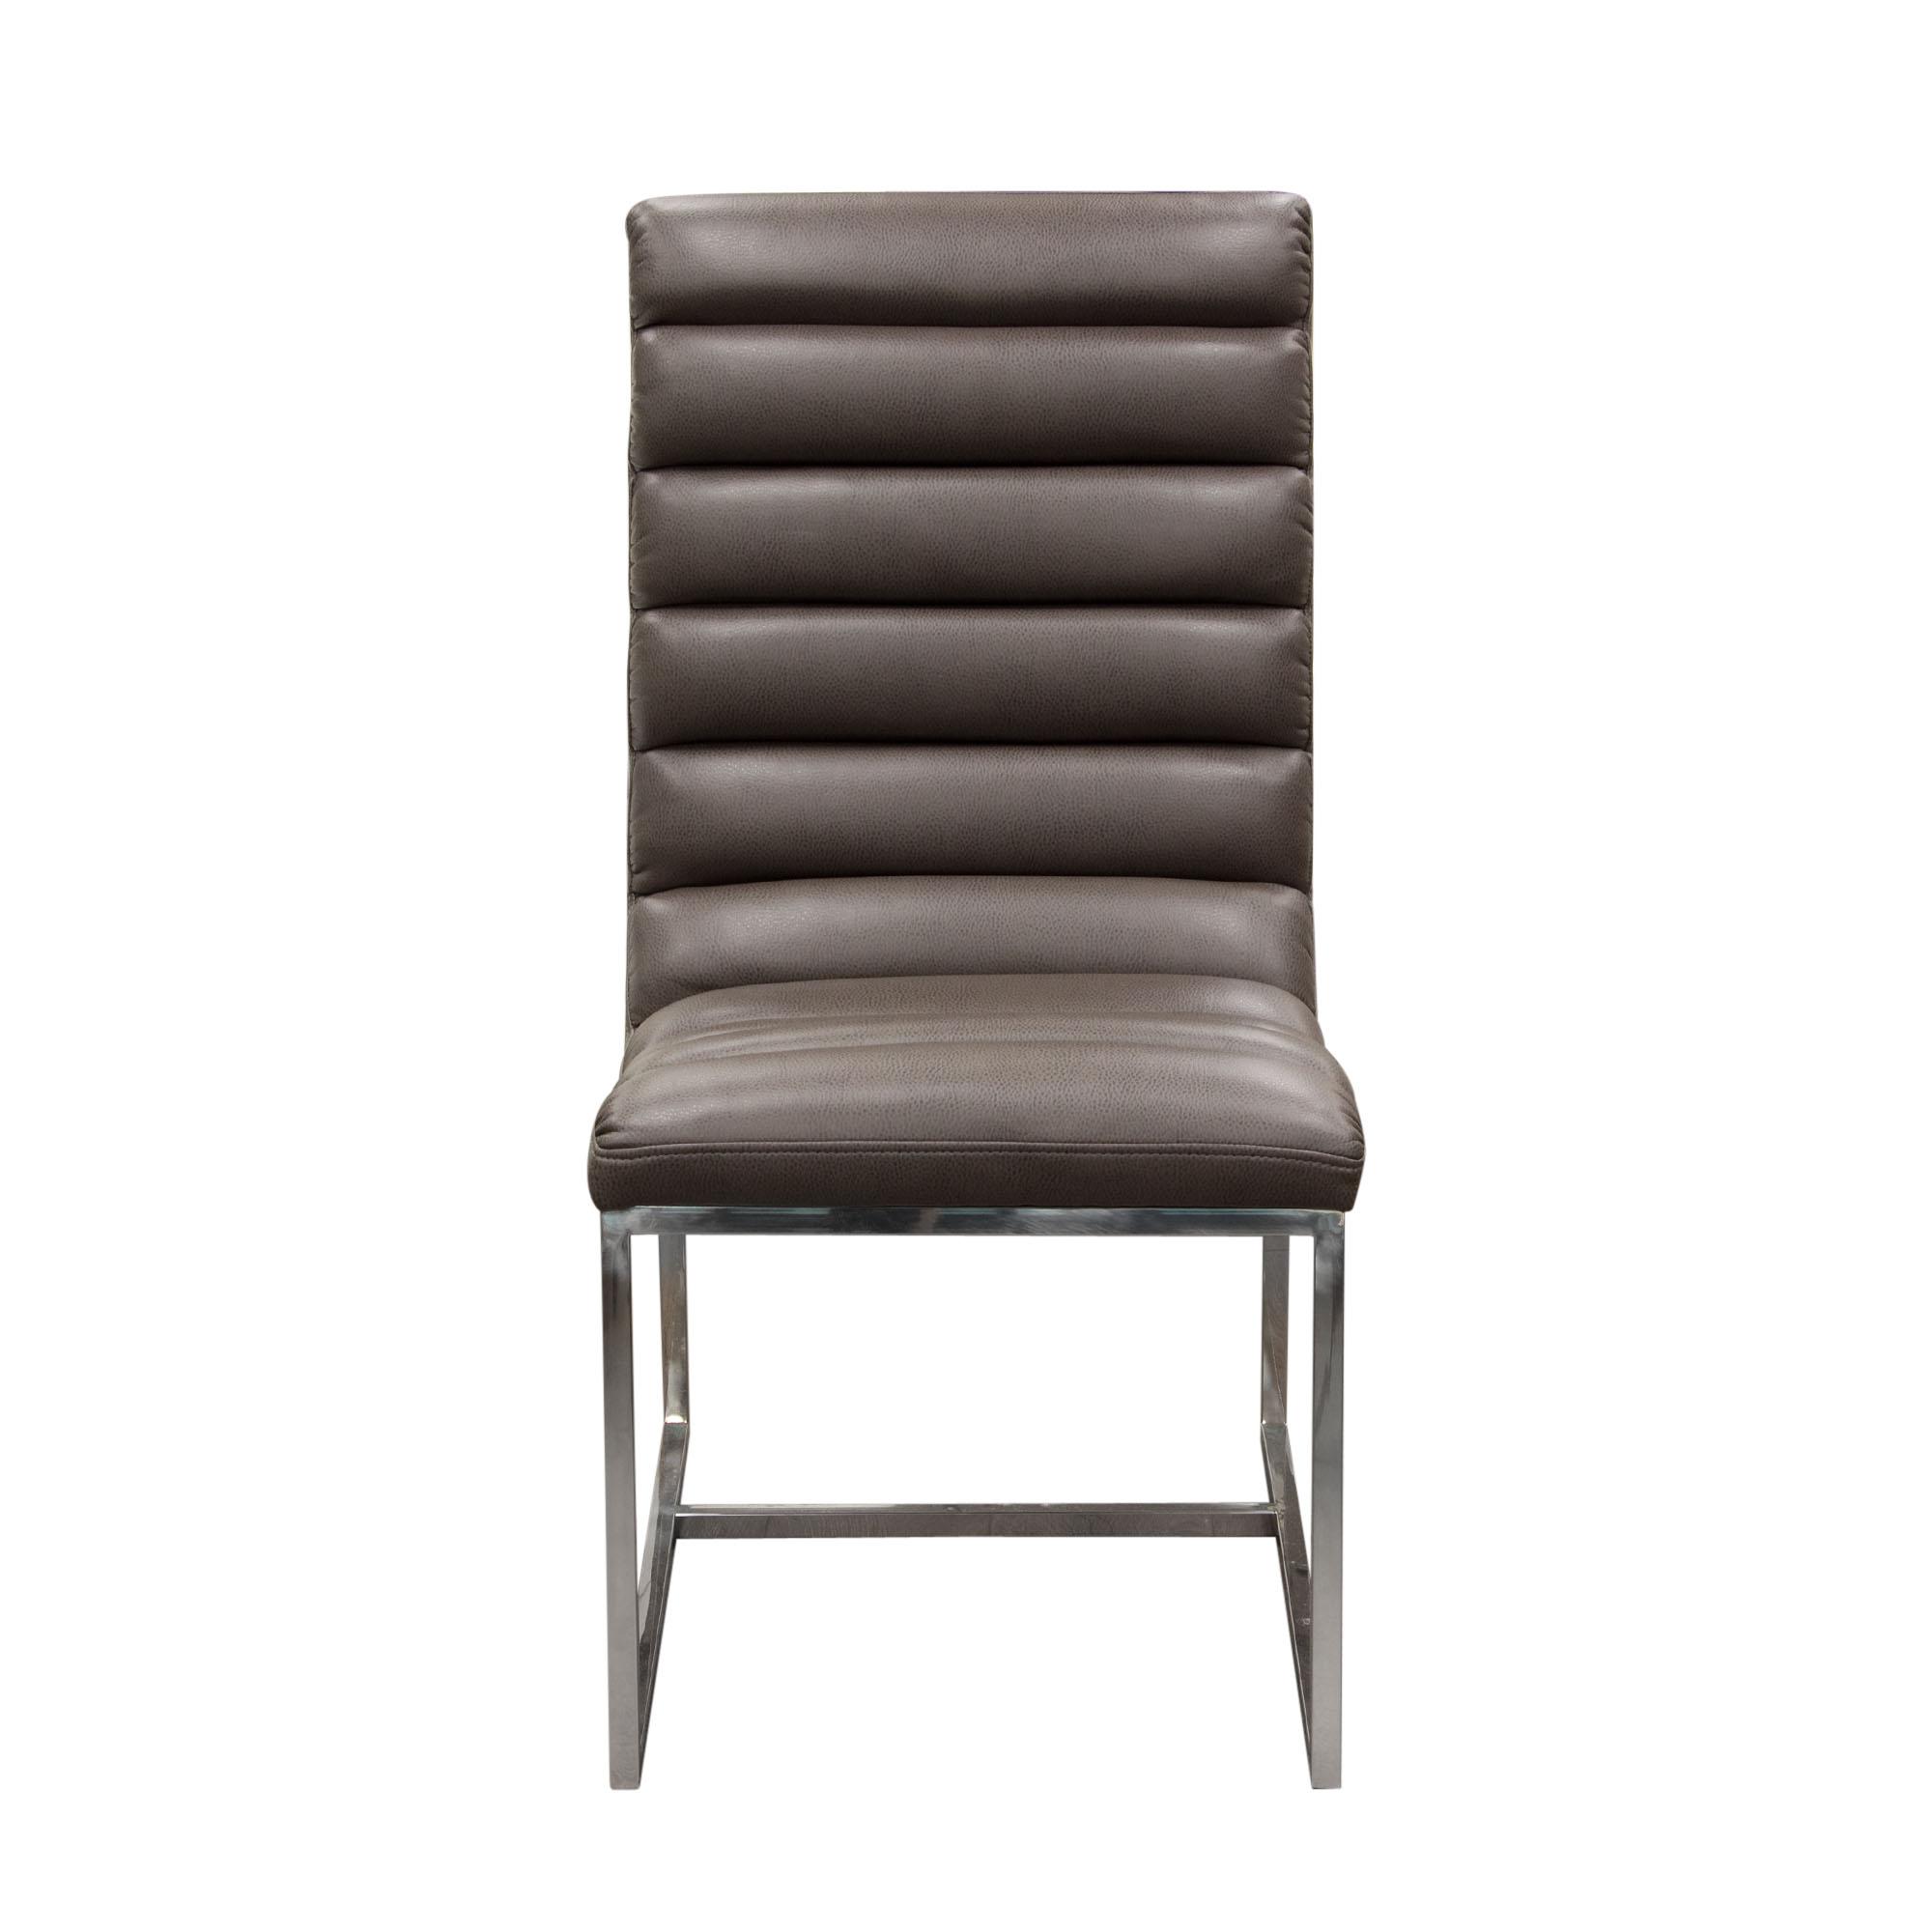 Diamond Sofa Bardot Grey Set of Two Dining Side Chairs - Item Number: BARDOTDCEG2